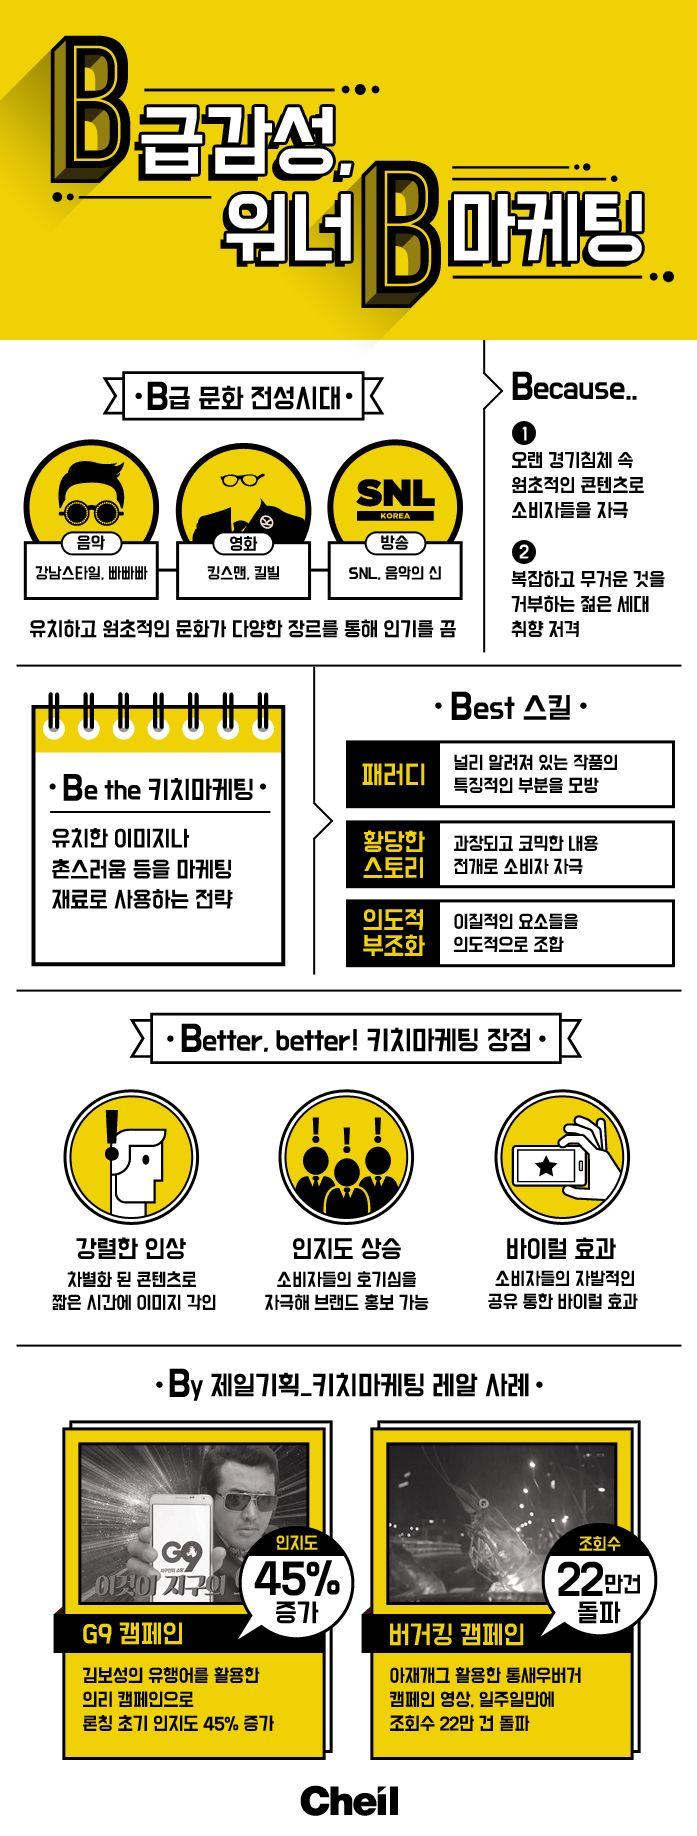 [Infographic] B급 감성과 키치 마케팅에 관한 인포그래픽